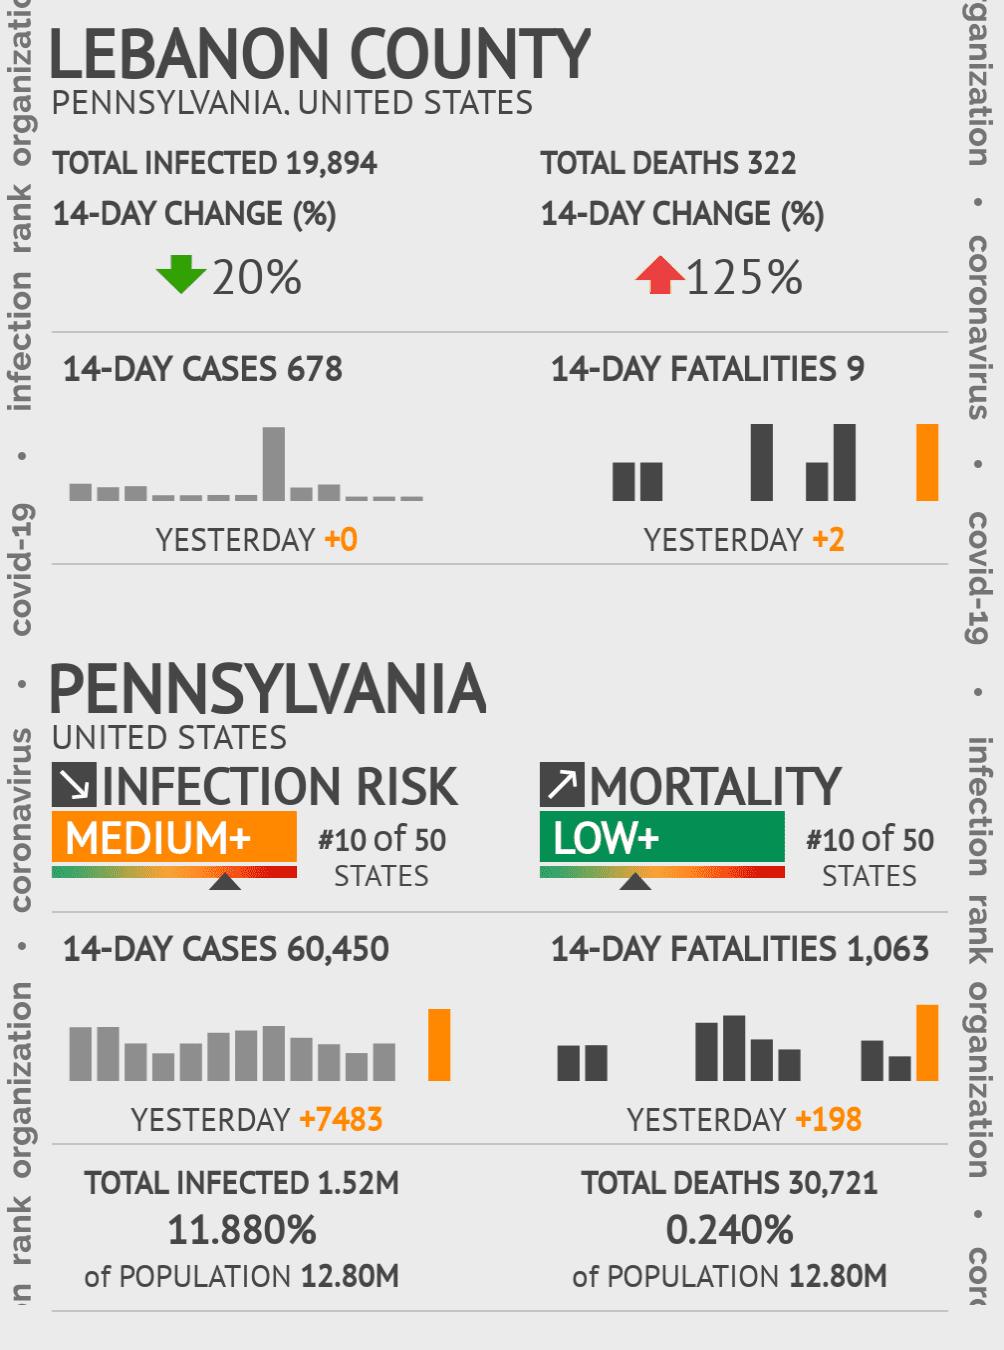 Lebanon County Coronavirus Covid-19 Risk of Infection on October 23, 2020